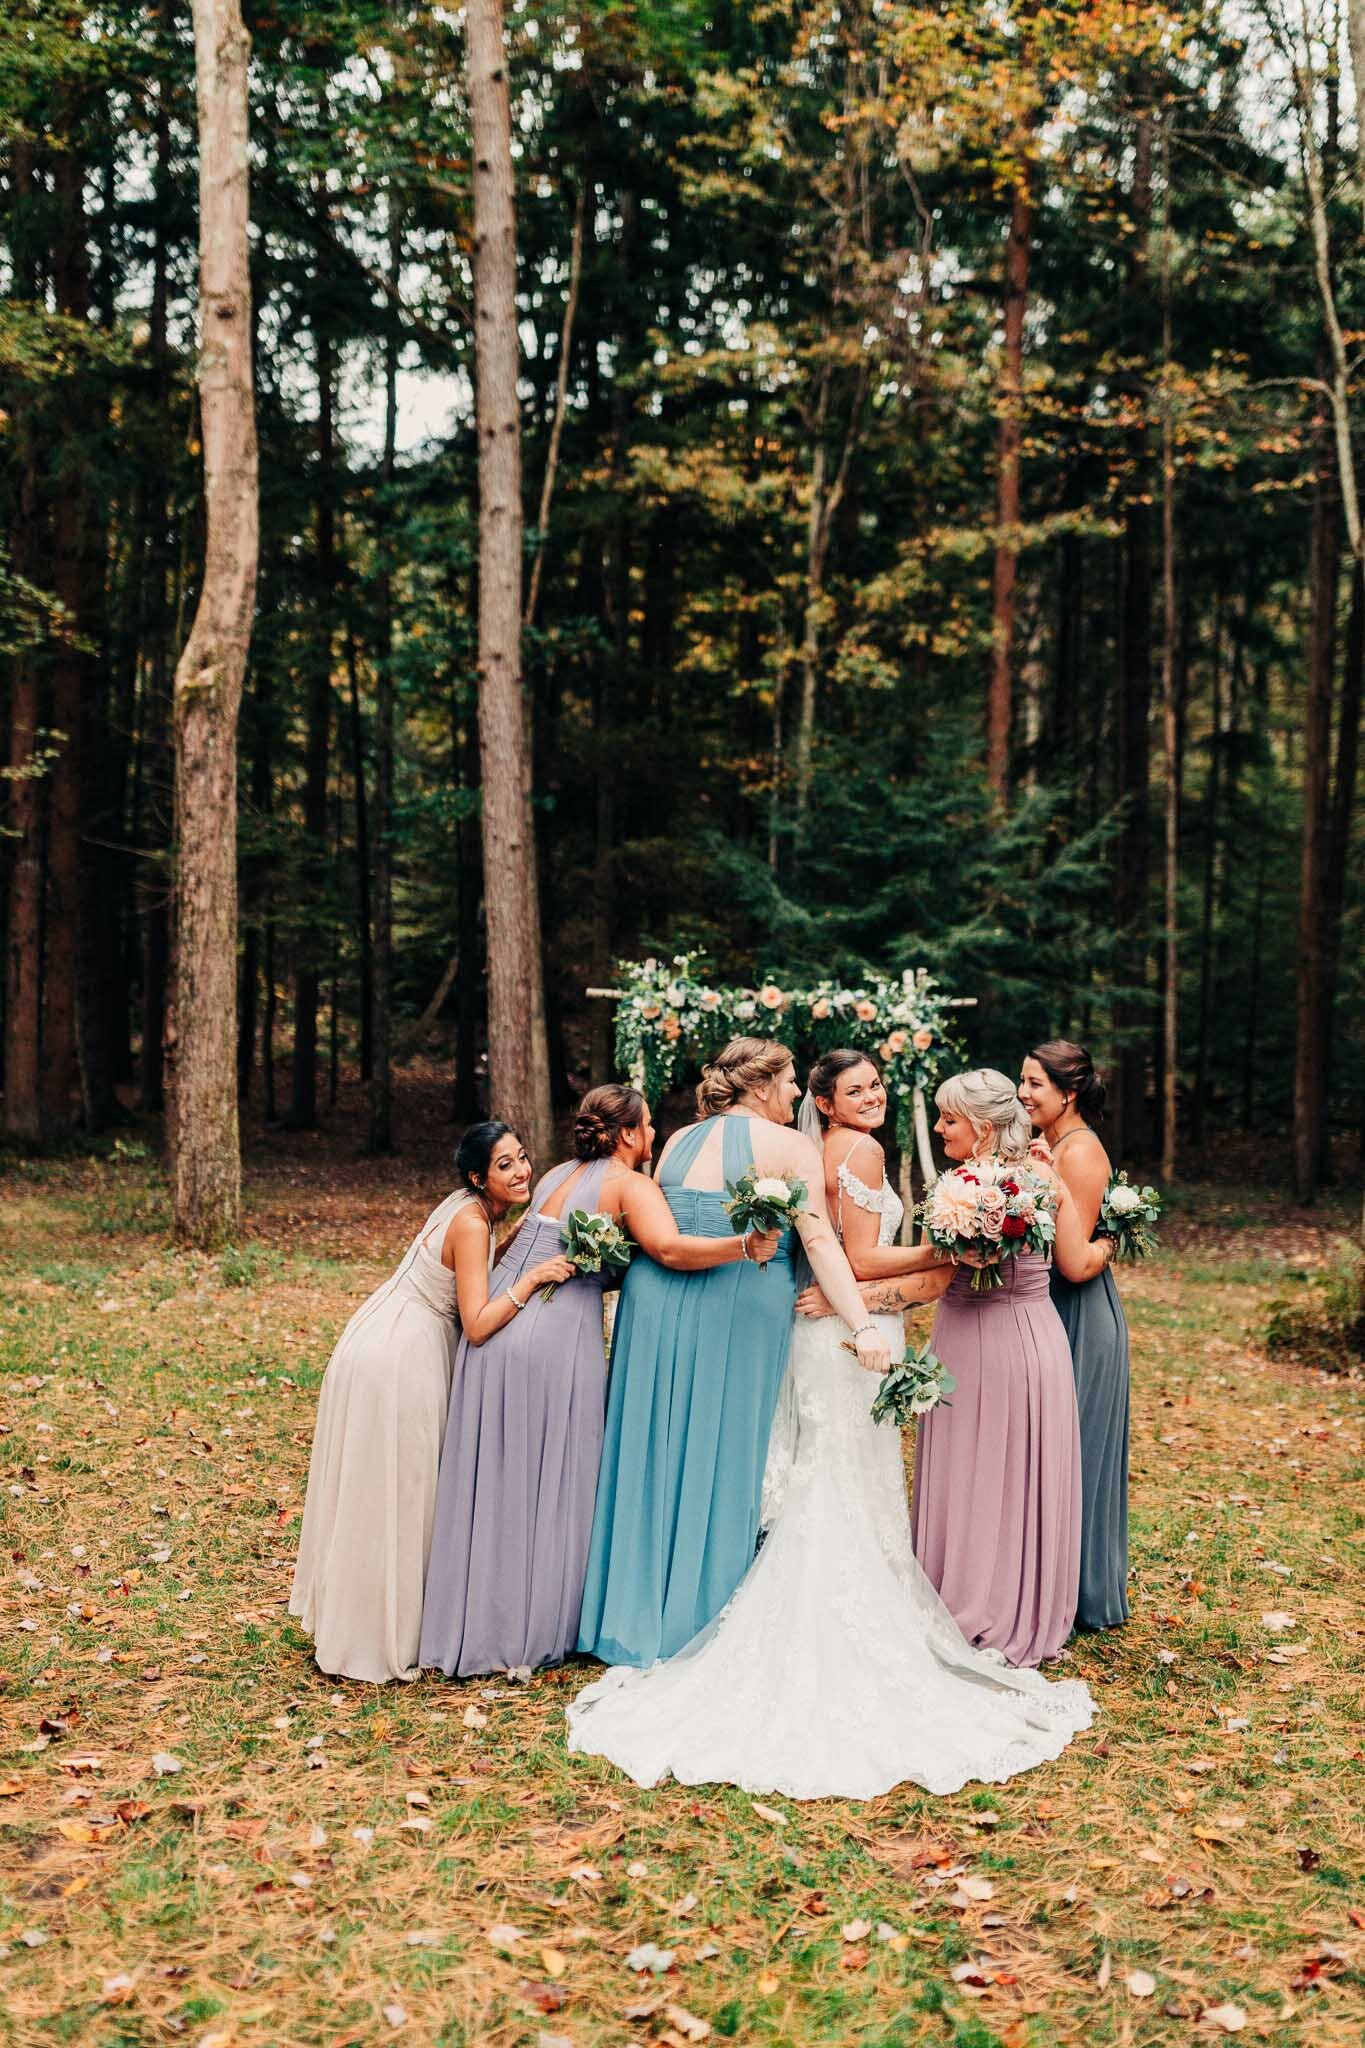 whitewoods-fall-wedding-8300.jpg